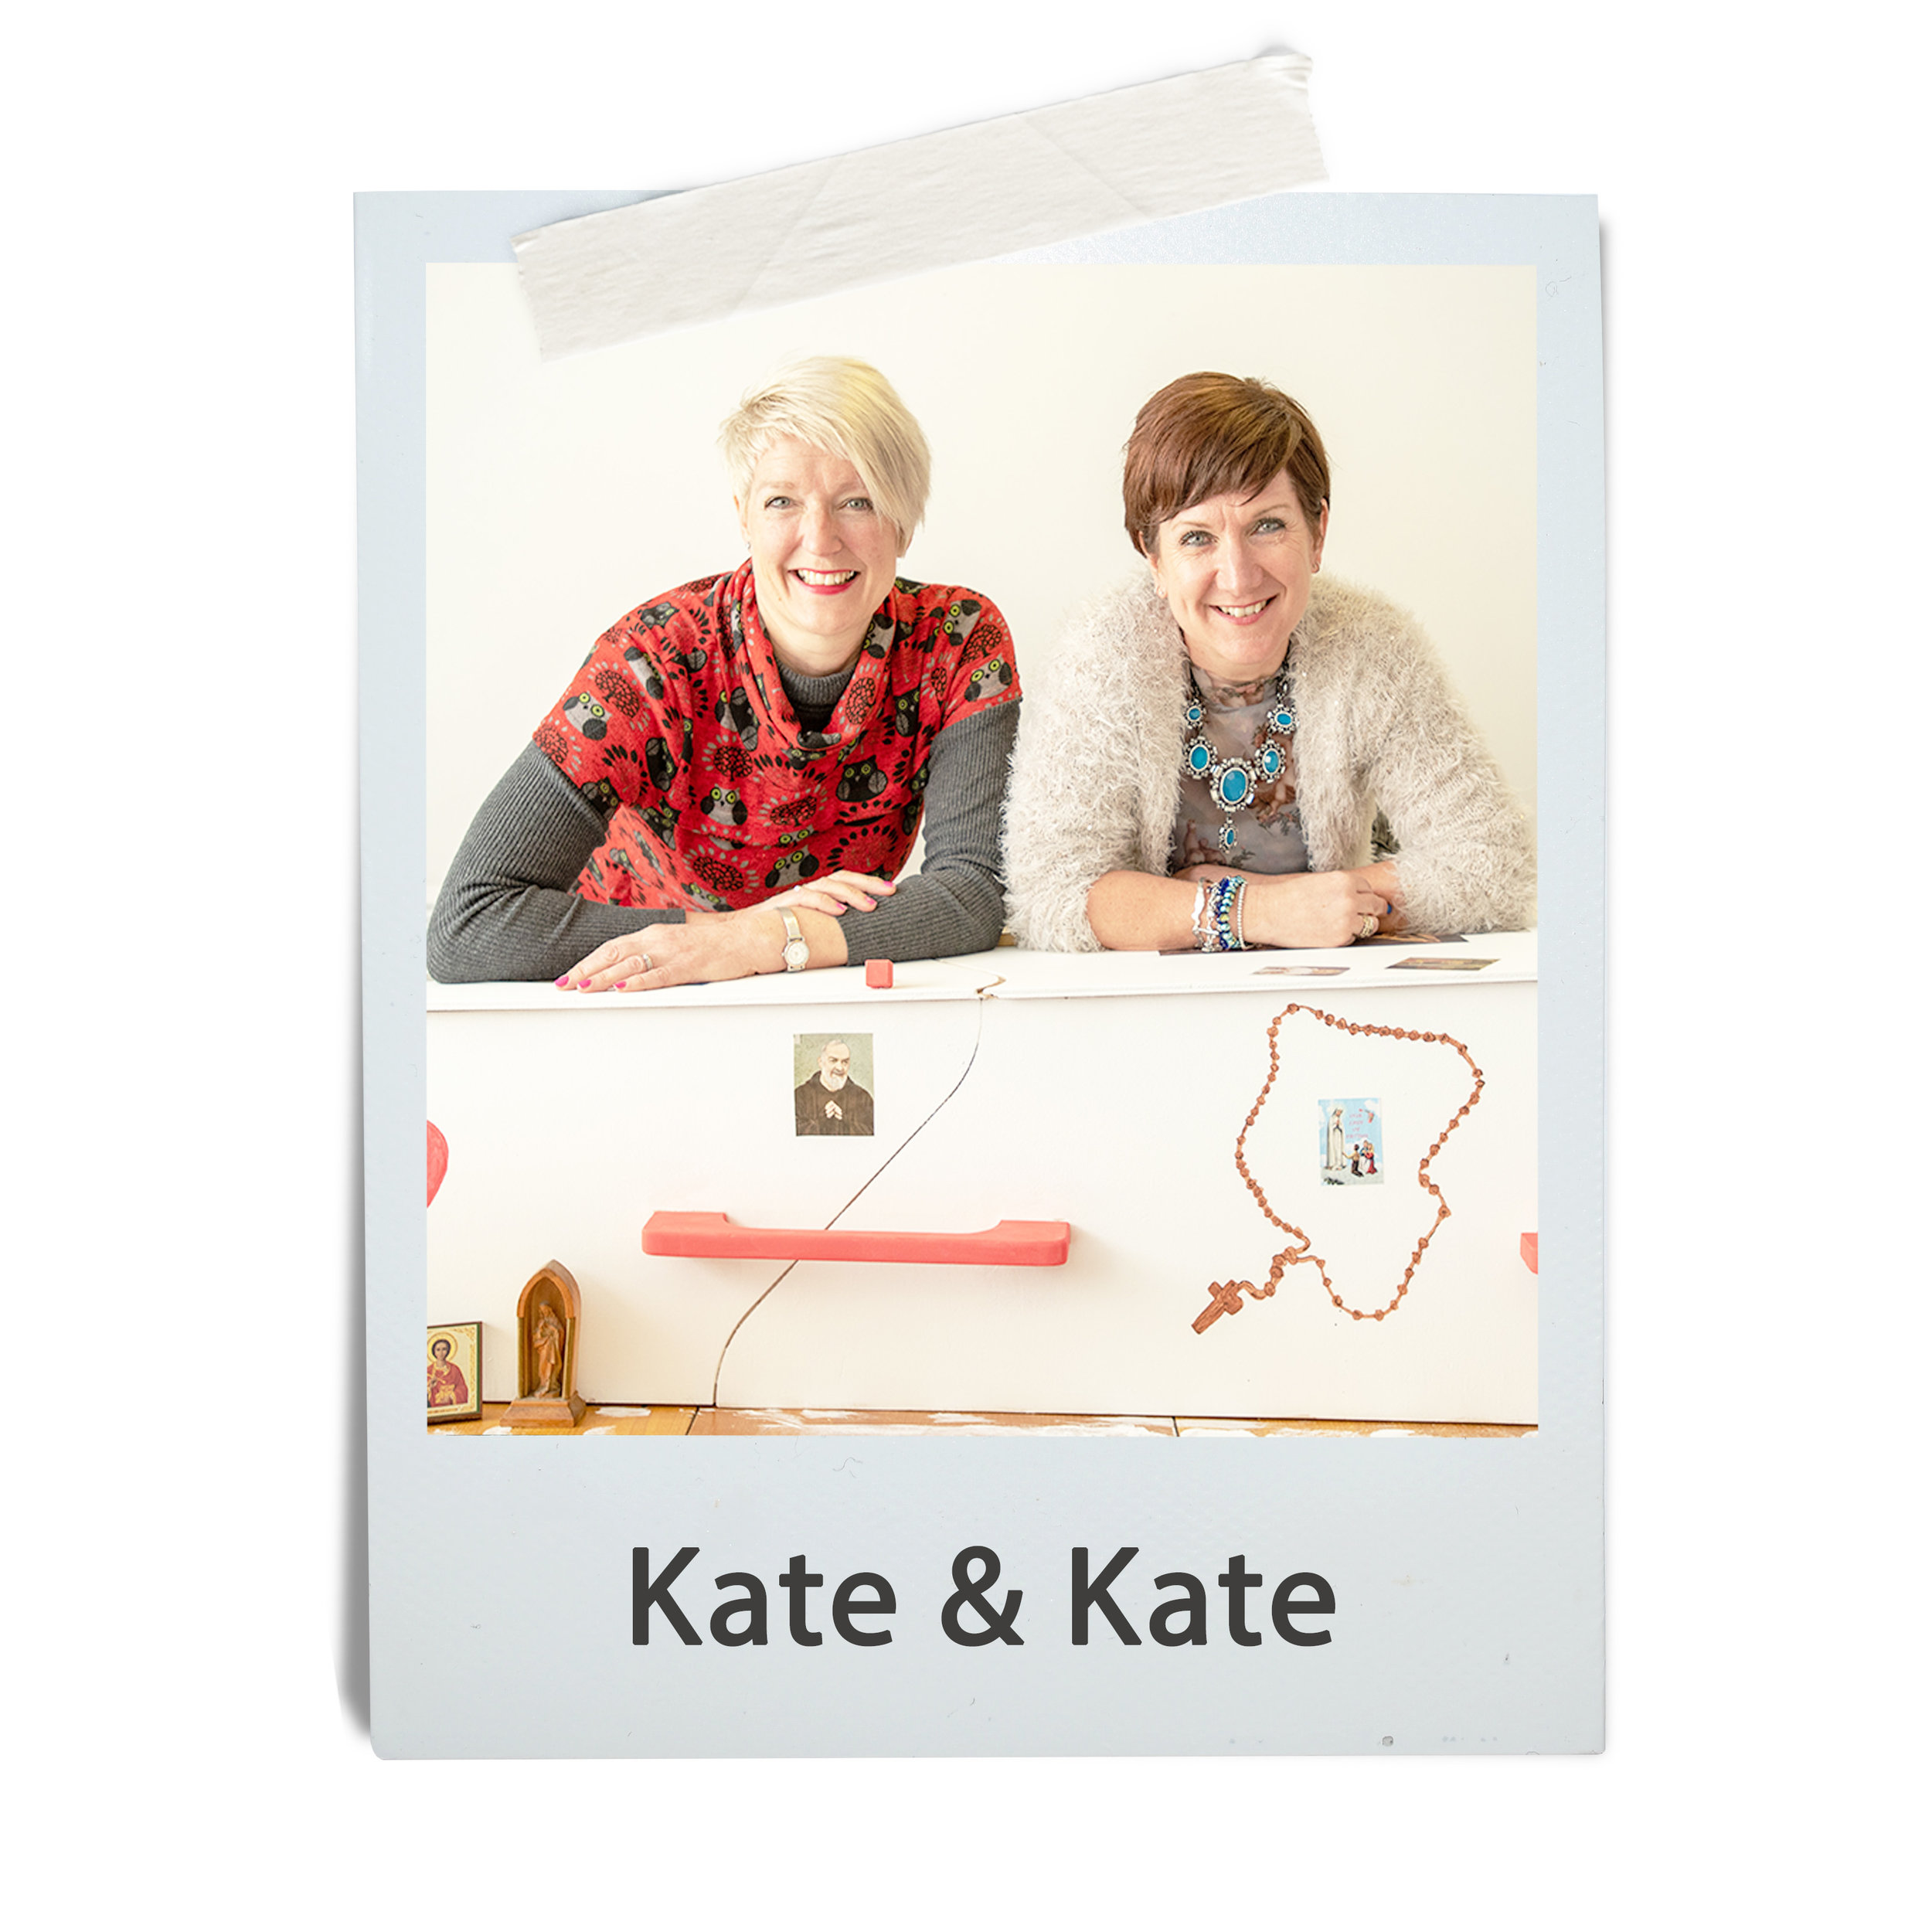 Kate & Kate